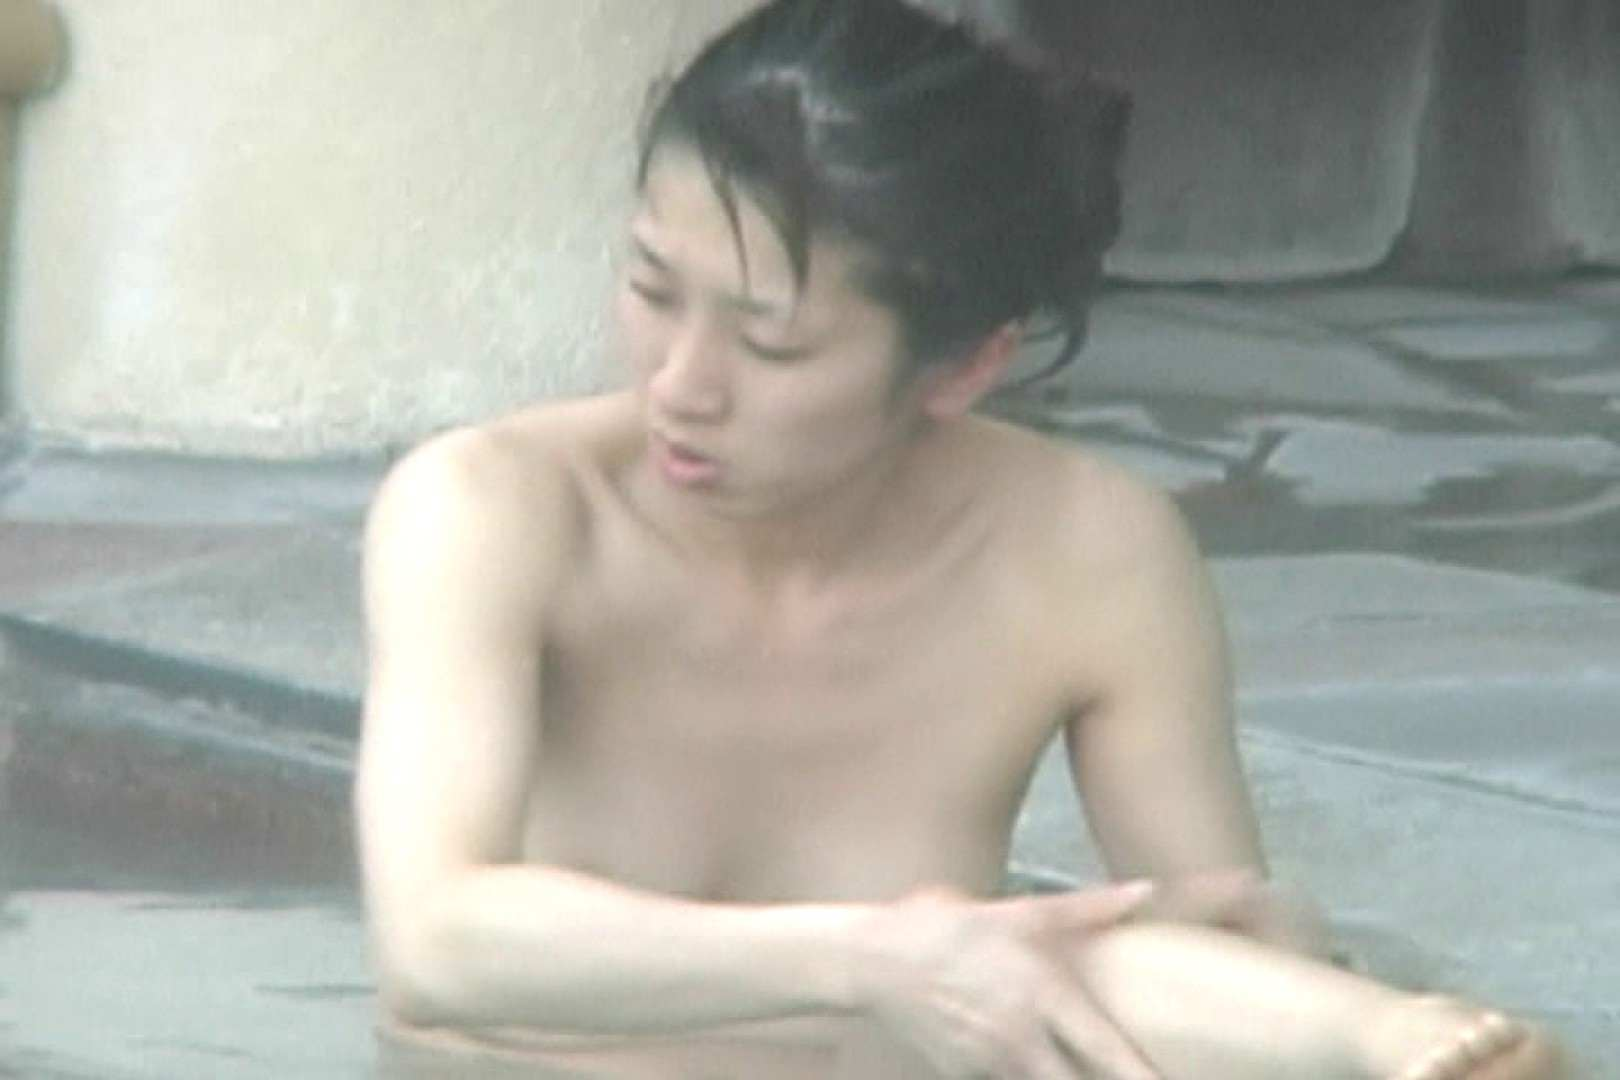 Aquaな露天風呂Vol.588 HなOL | 盗撮  66pic 65